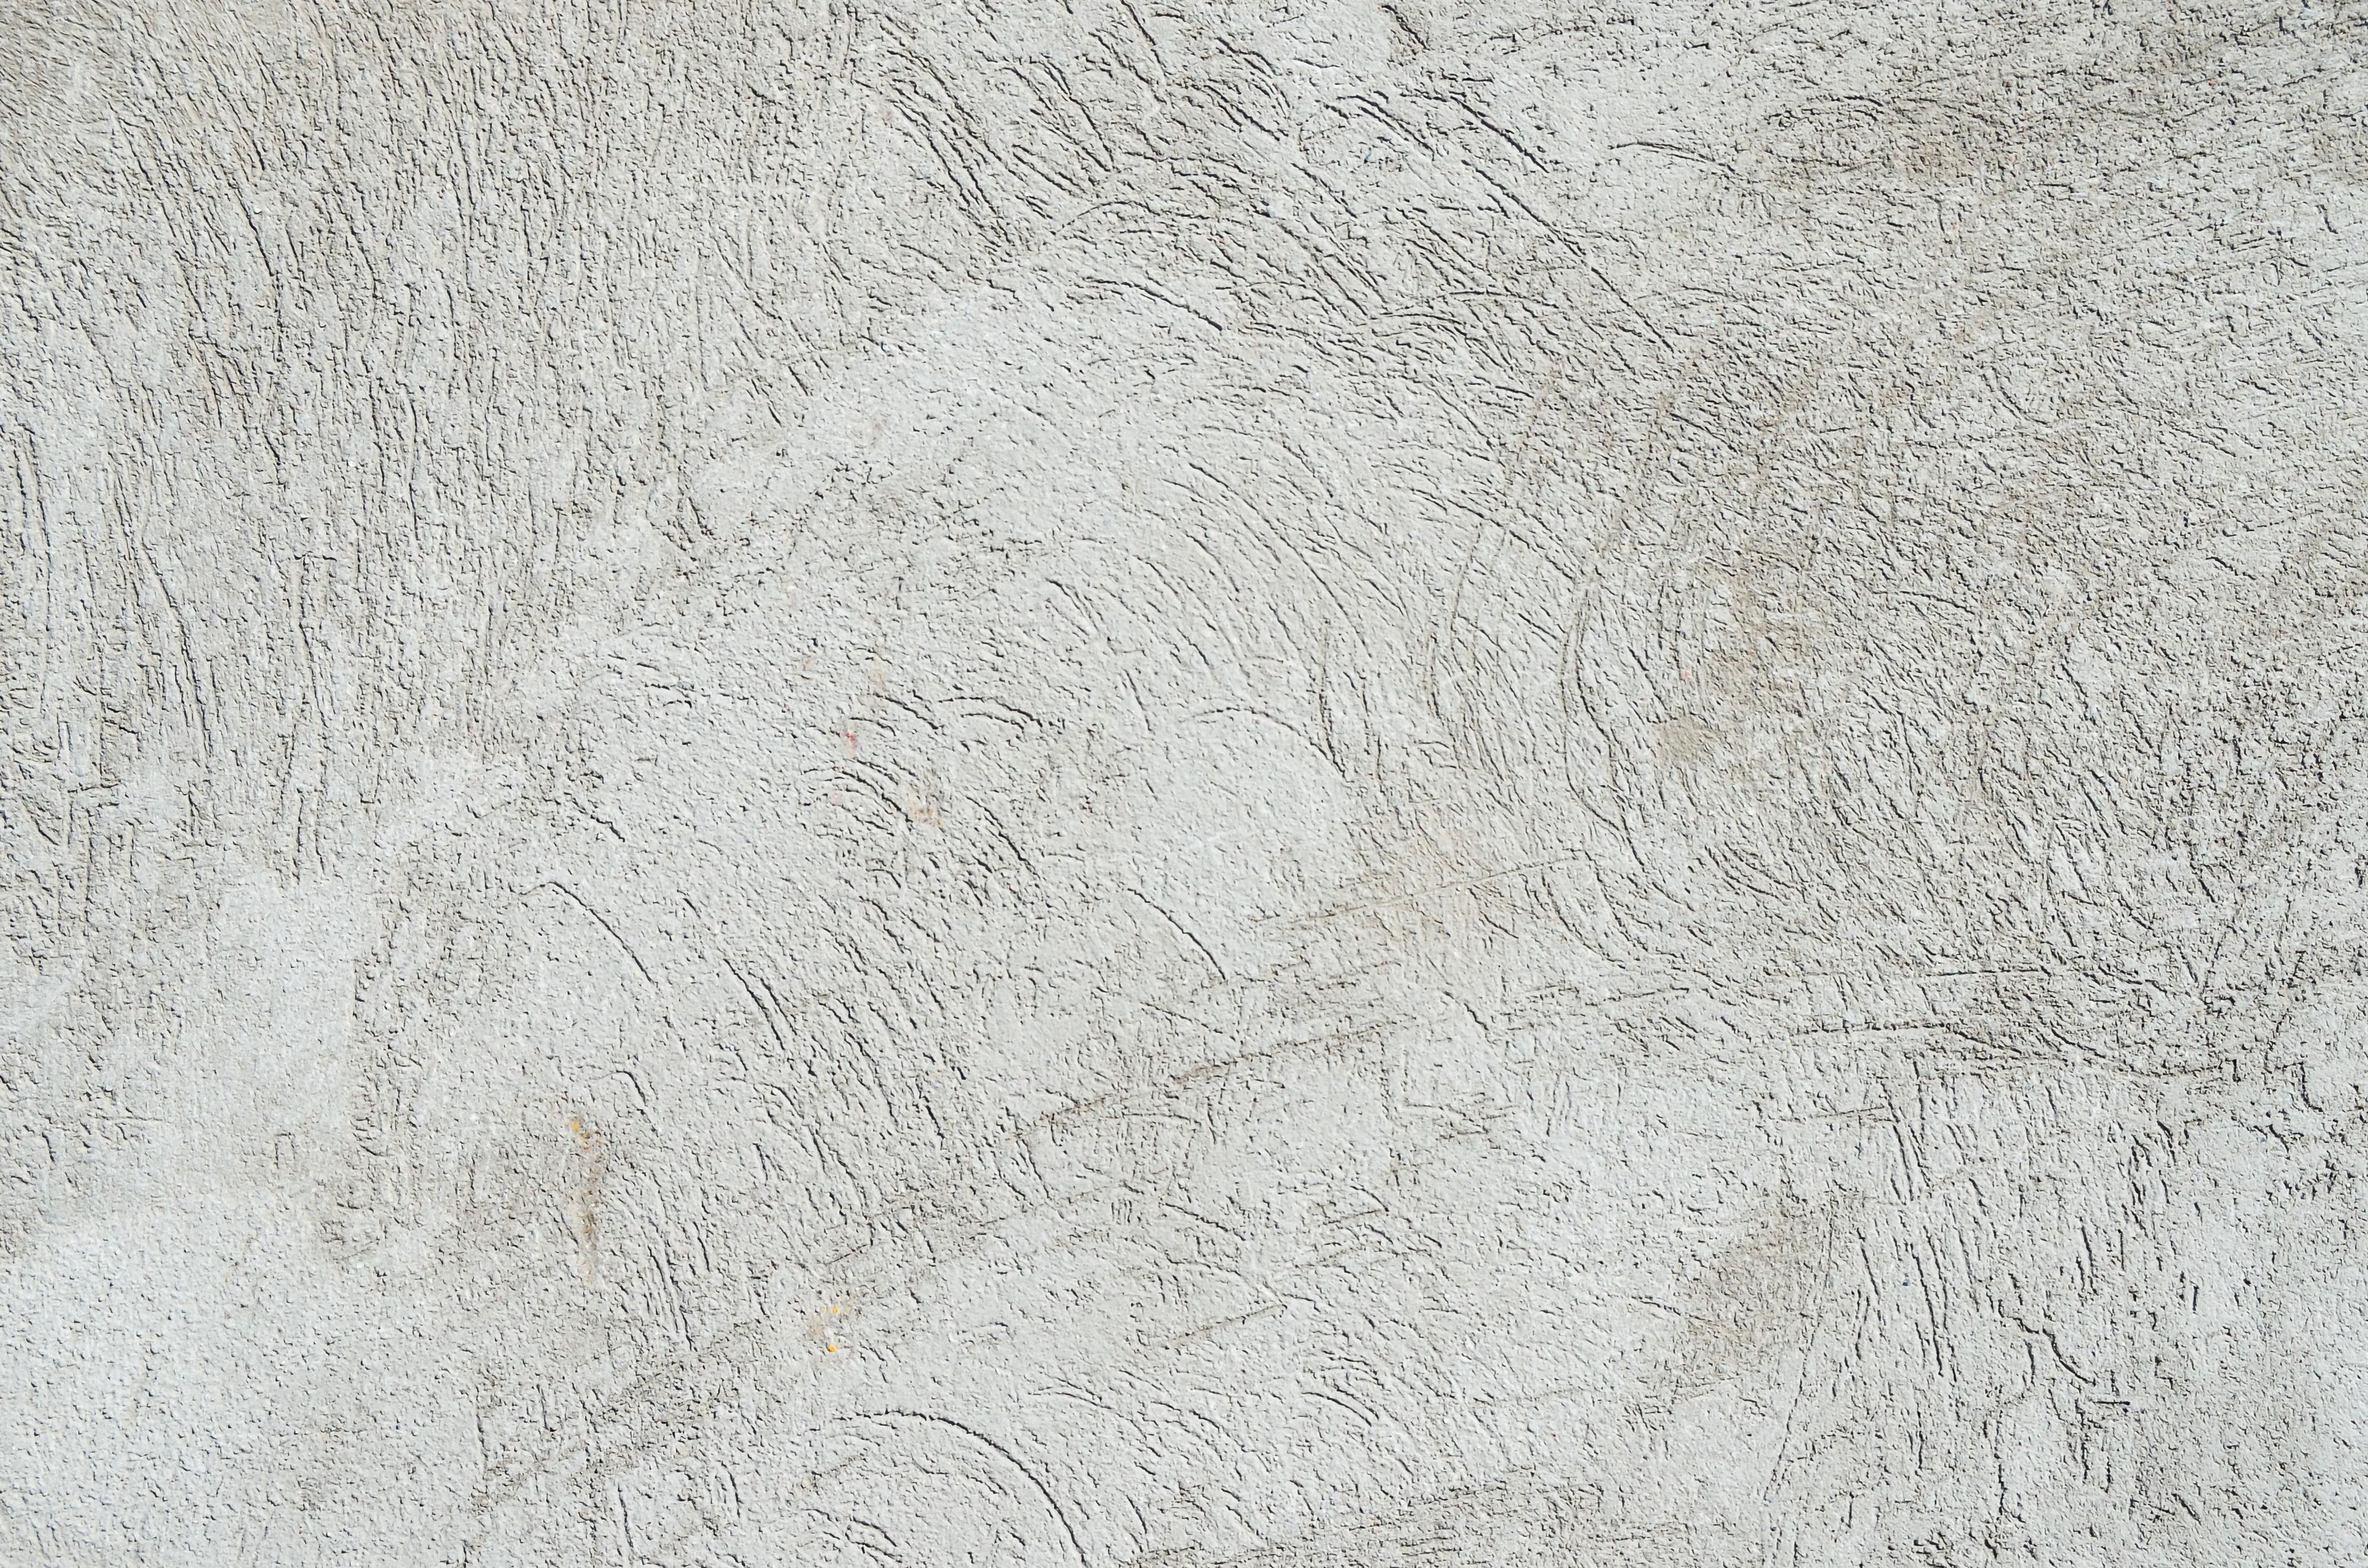 Wall surface photo